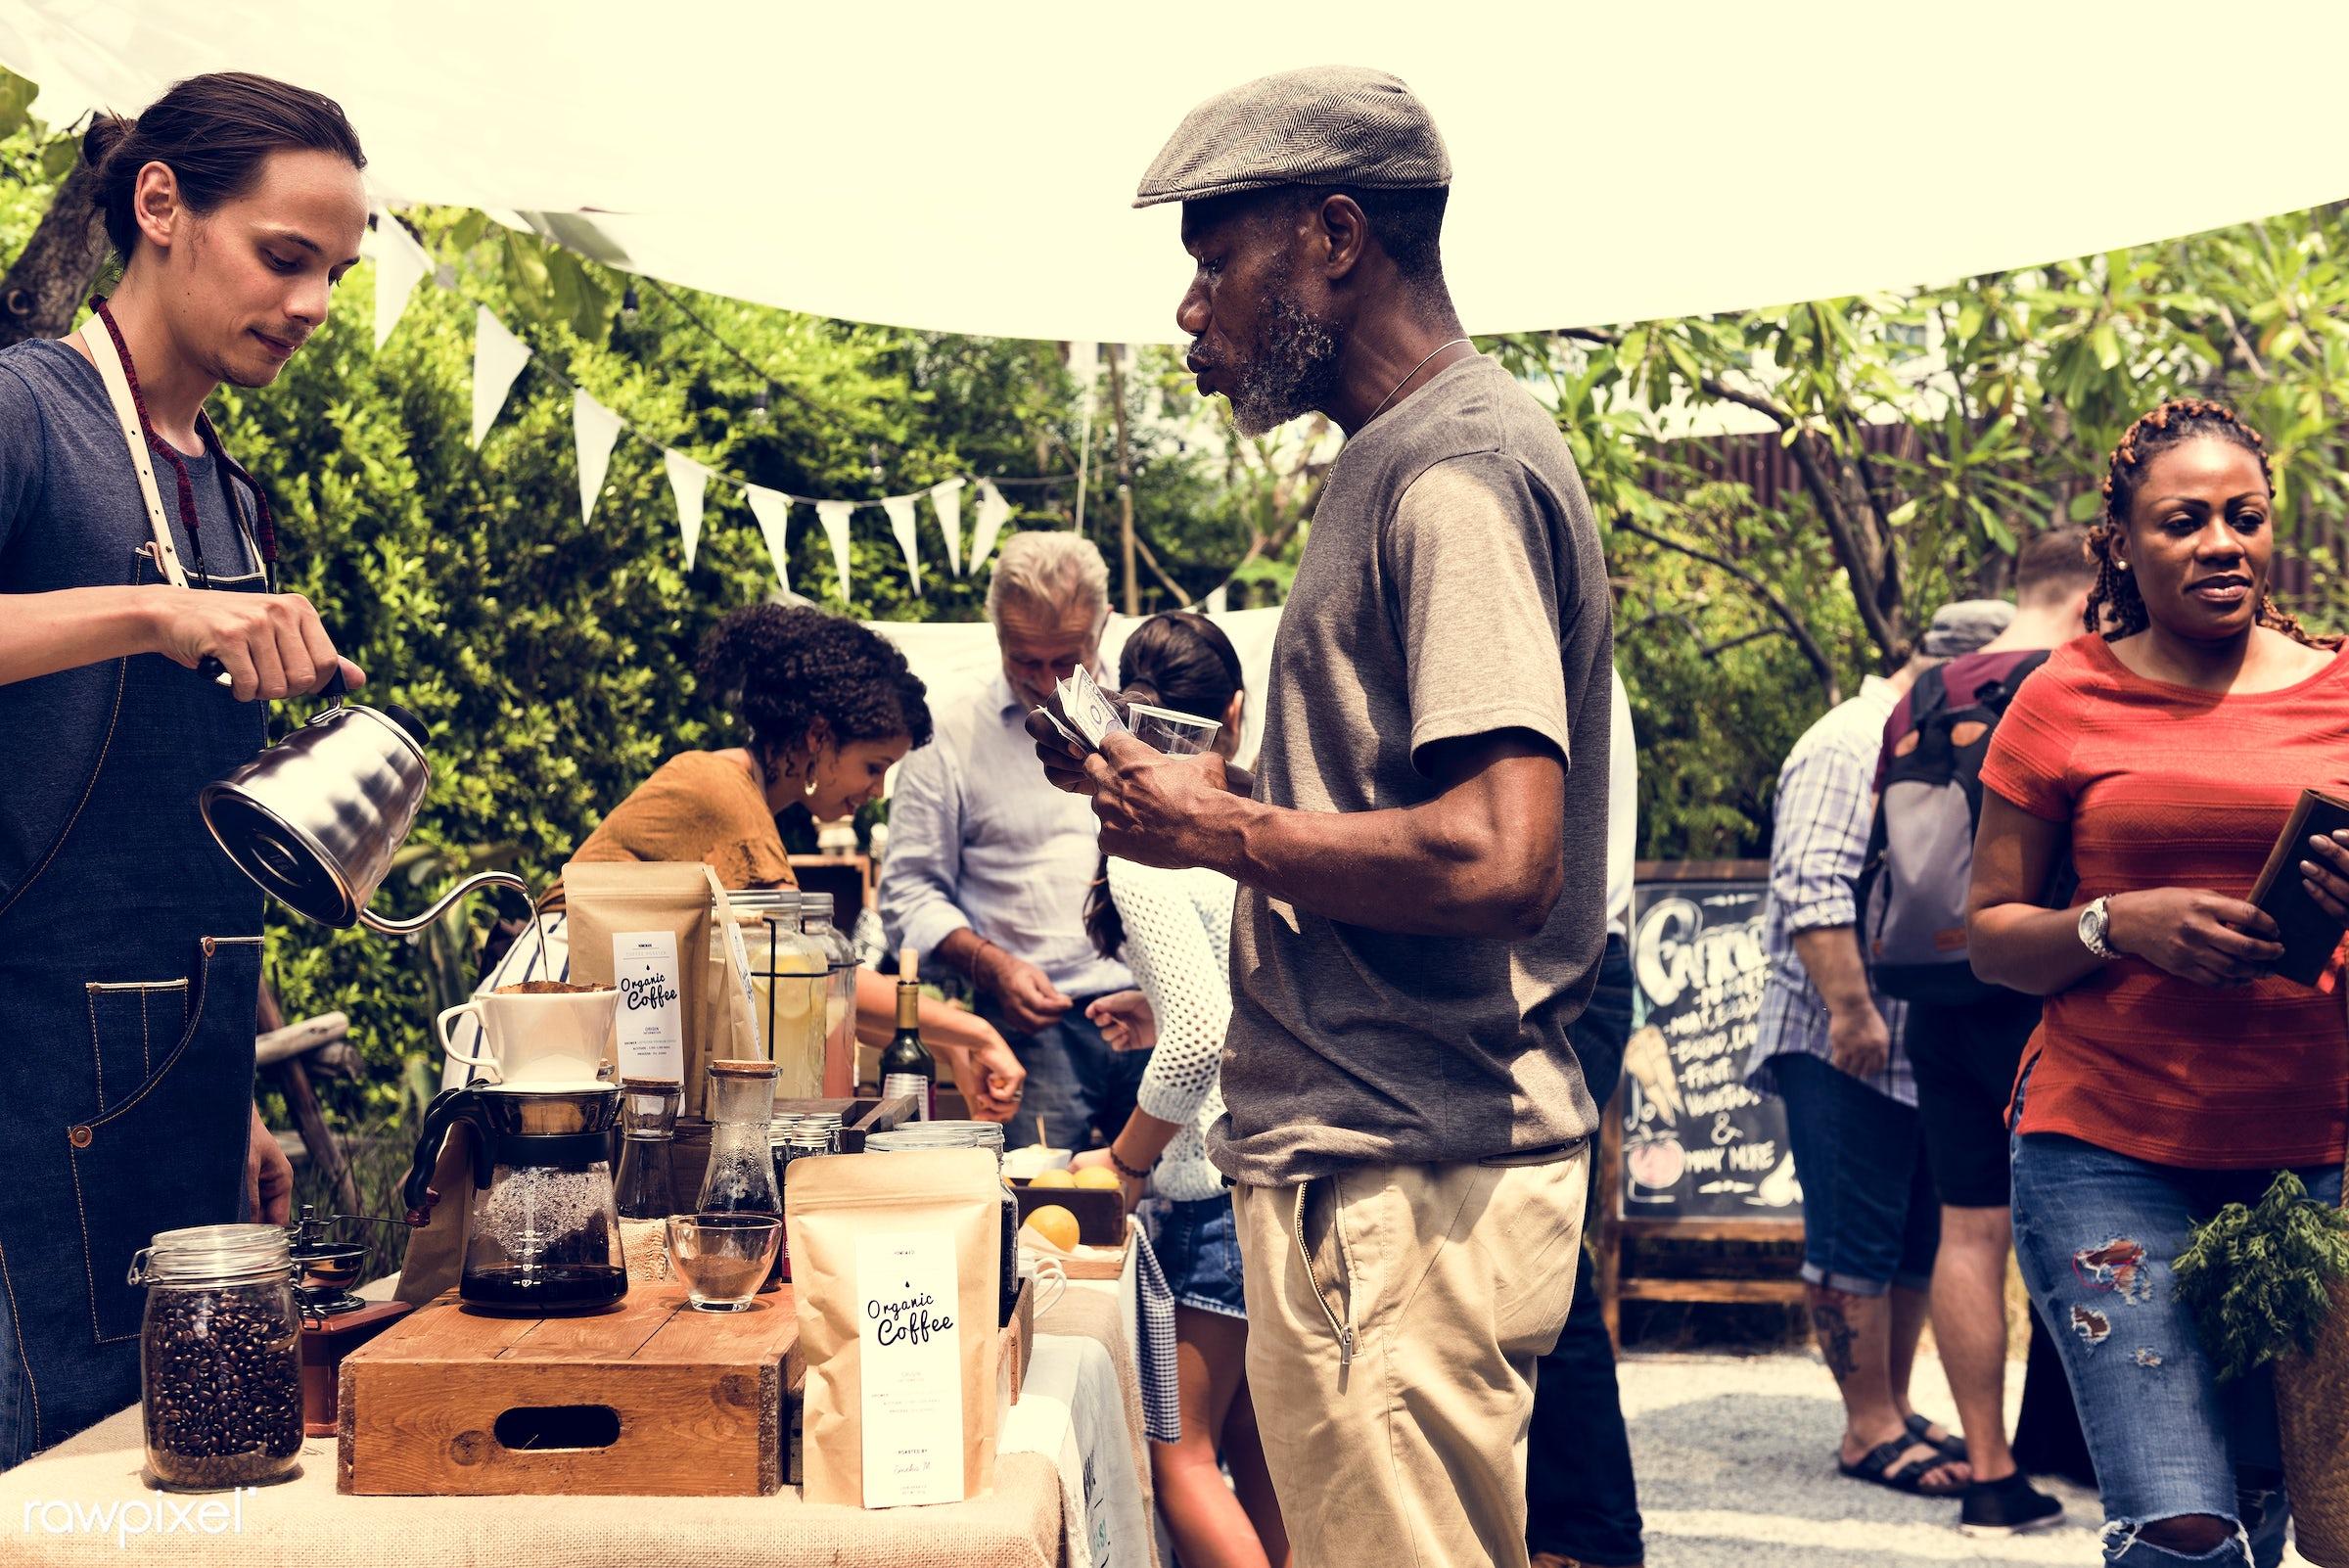 shop, person, aroma, caffeine, people, pot, farmer, brew, woman, lifestyle, drink, blend, refresh, preparation, coffee,...